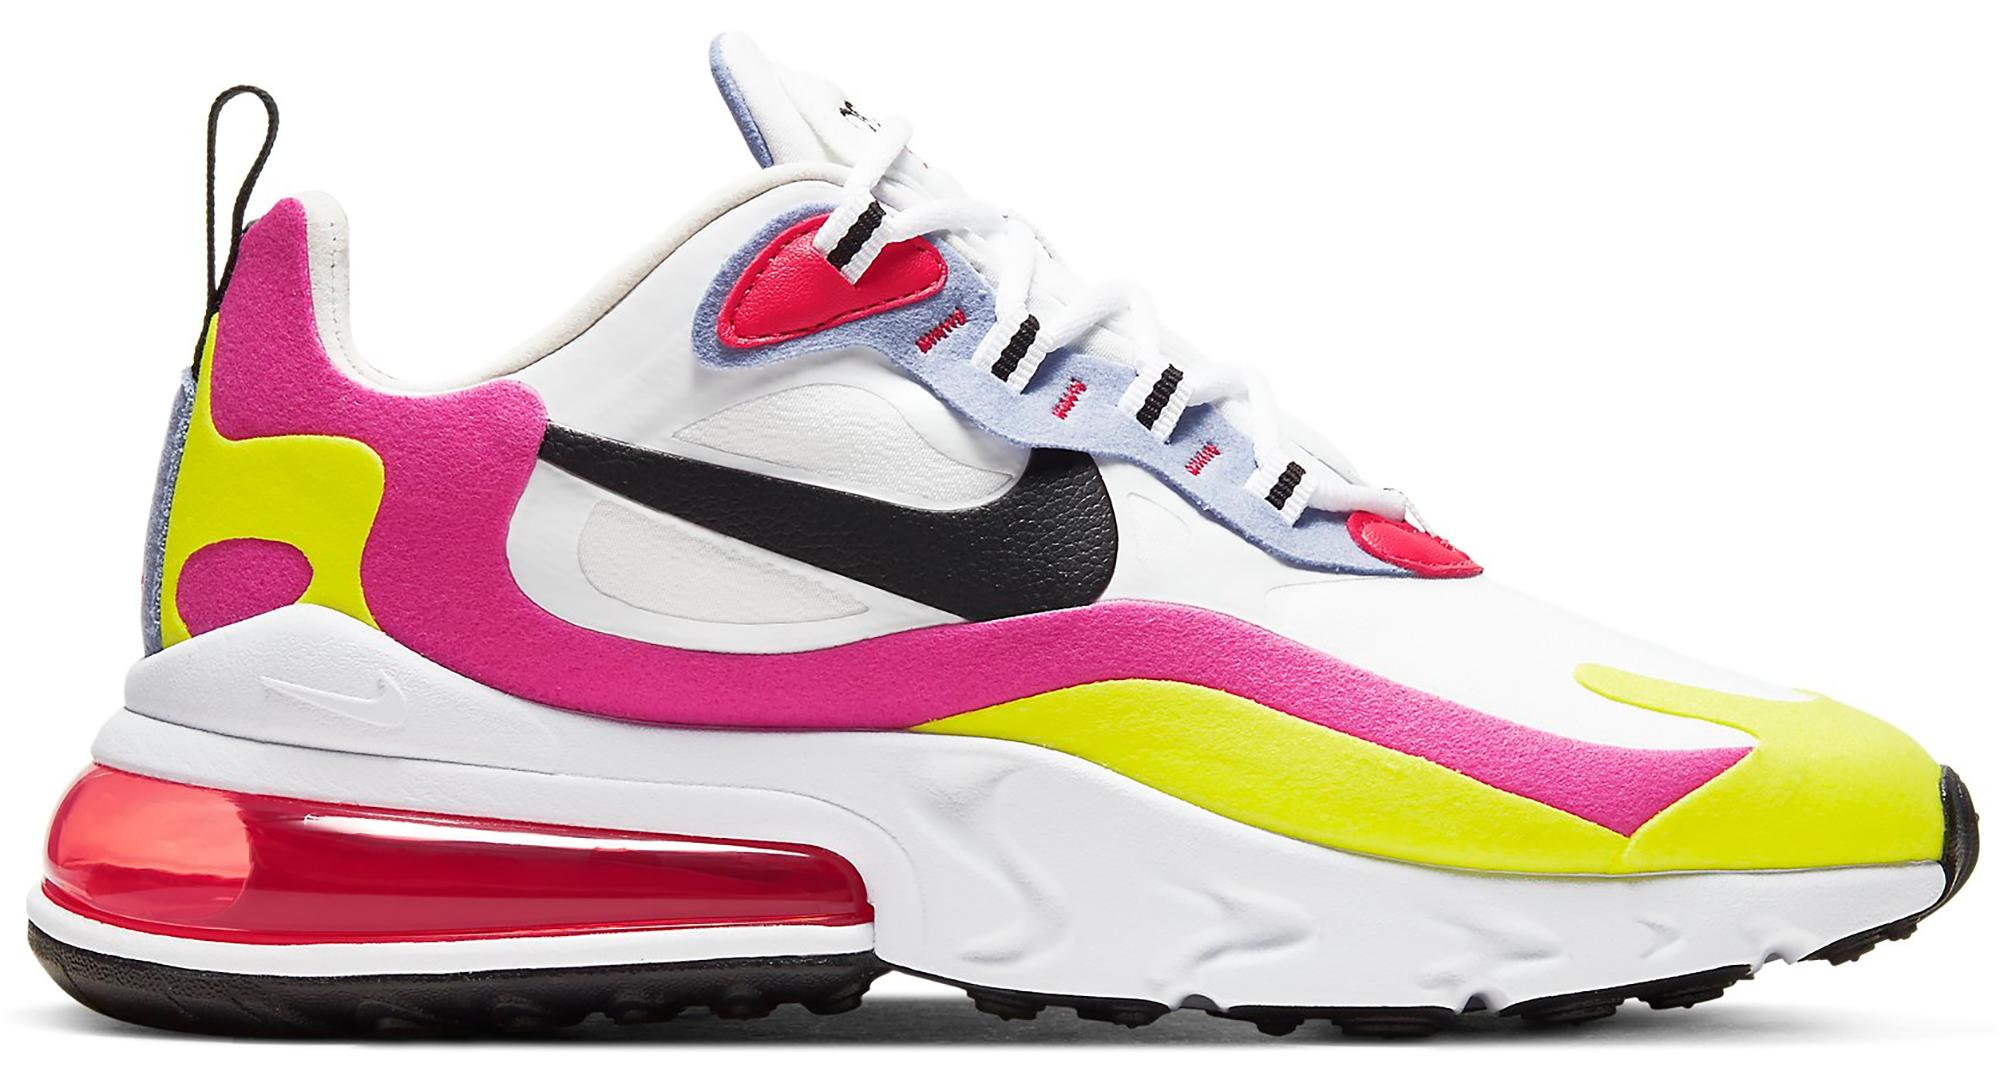 Nike Air Max 270 React White Pink